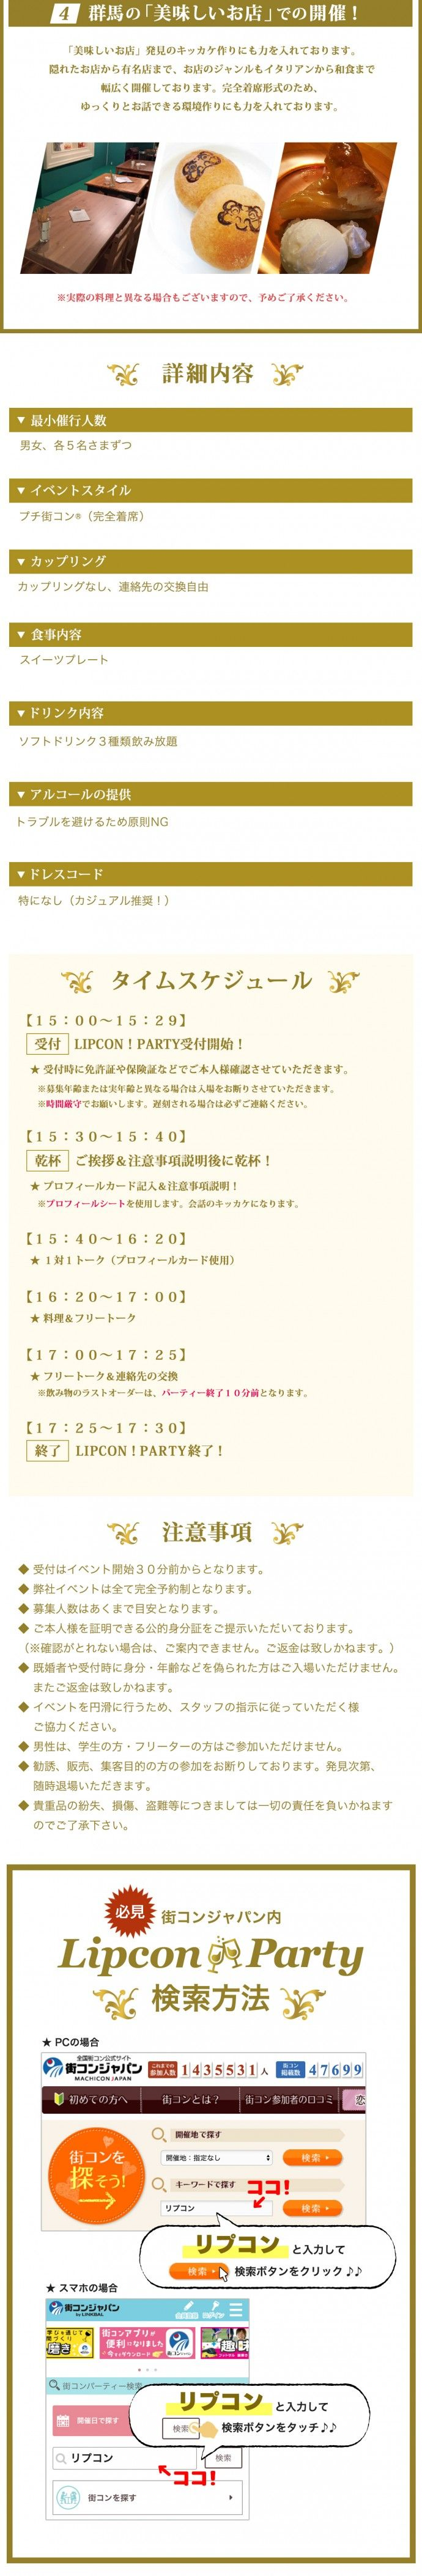 02_fukucafe_1530